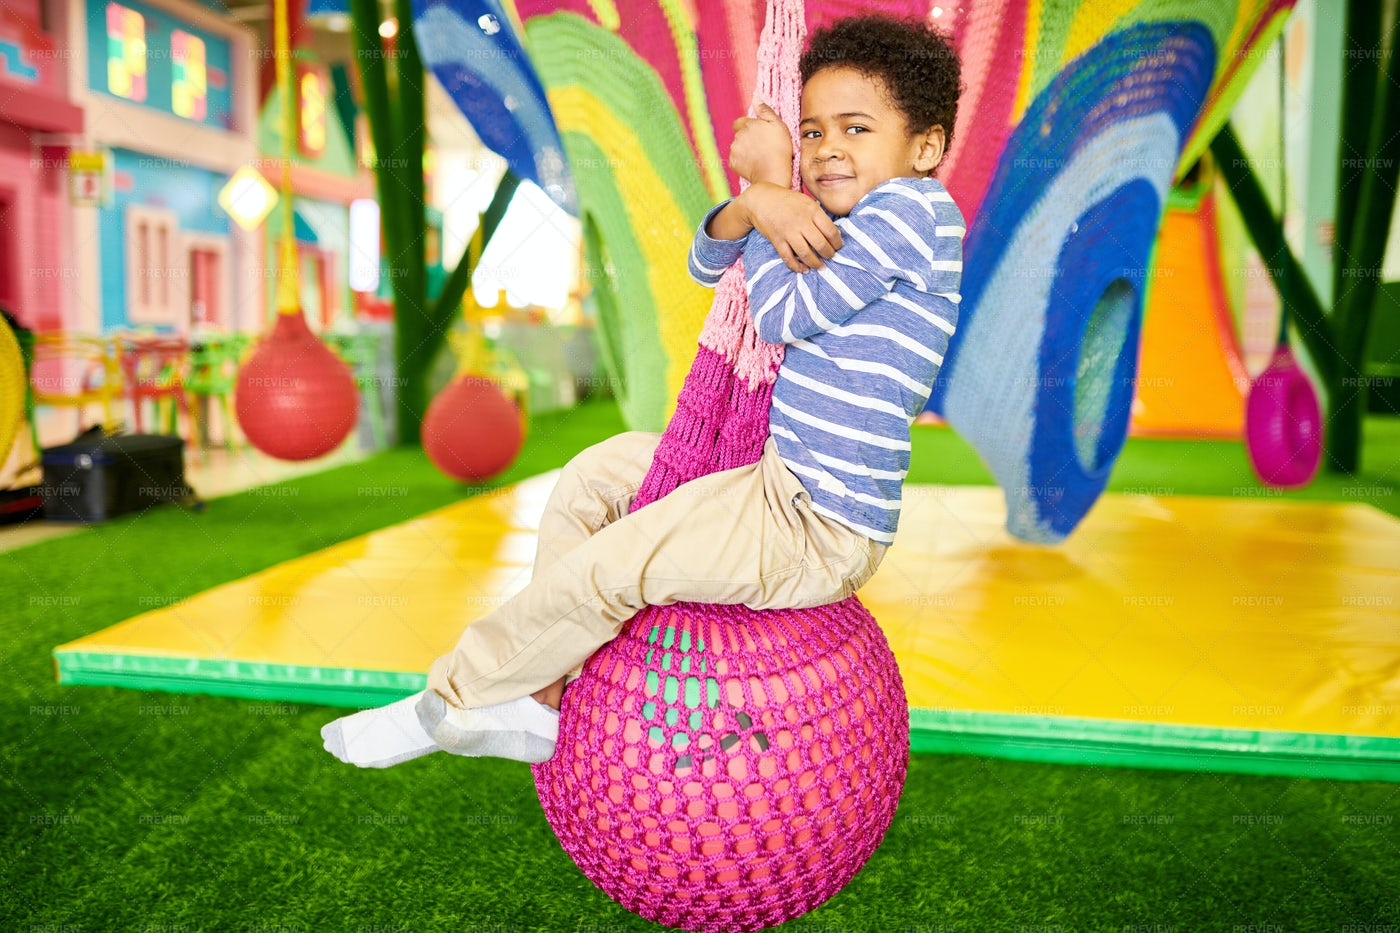 African-American Boy In Children...: Stock Photos